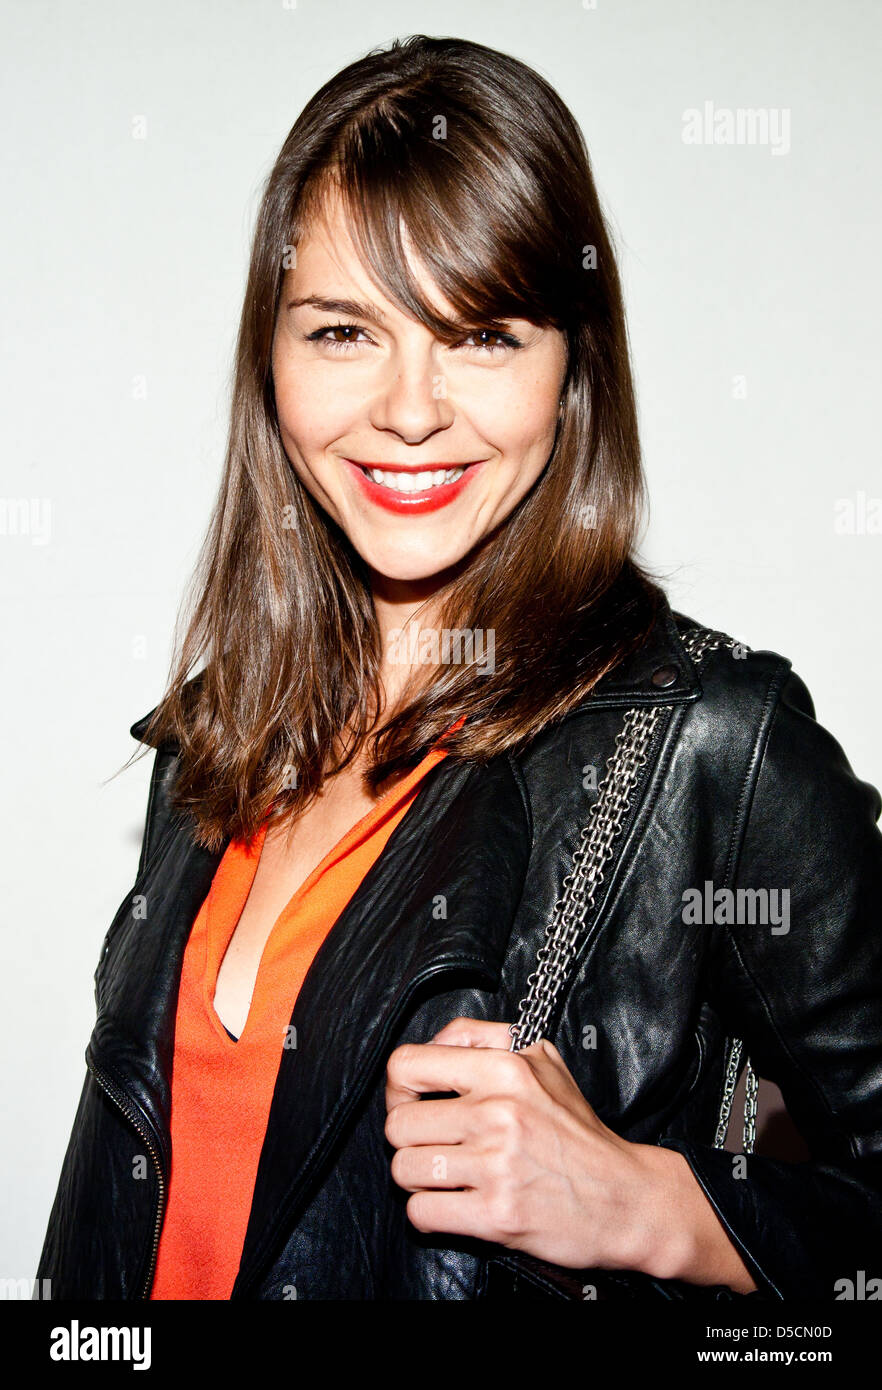 Susan Hoecke at the launch of Filmfest Hamburg with the premiere of 'Auf Wiedersehen' at CinemaxX movie - Stock Image